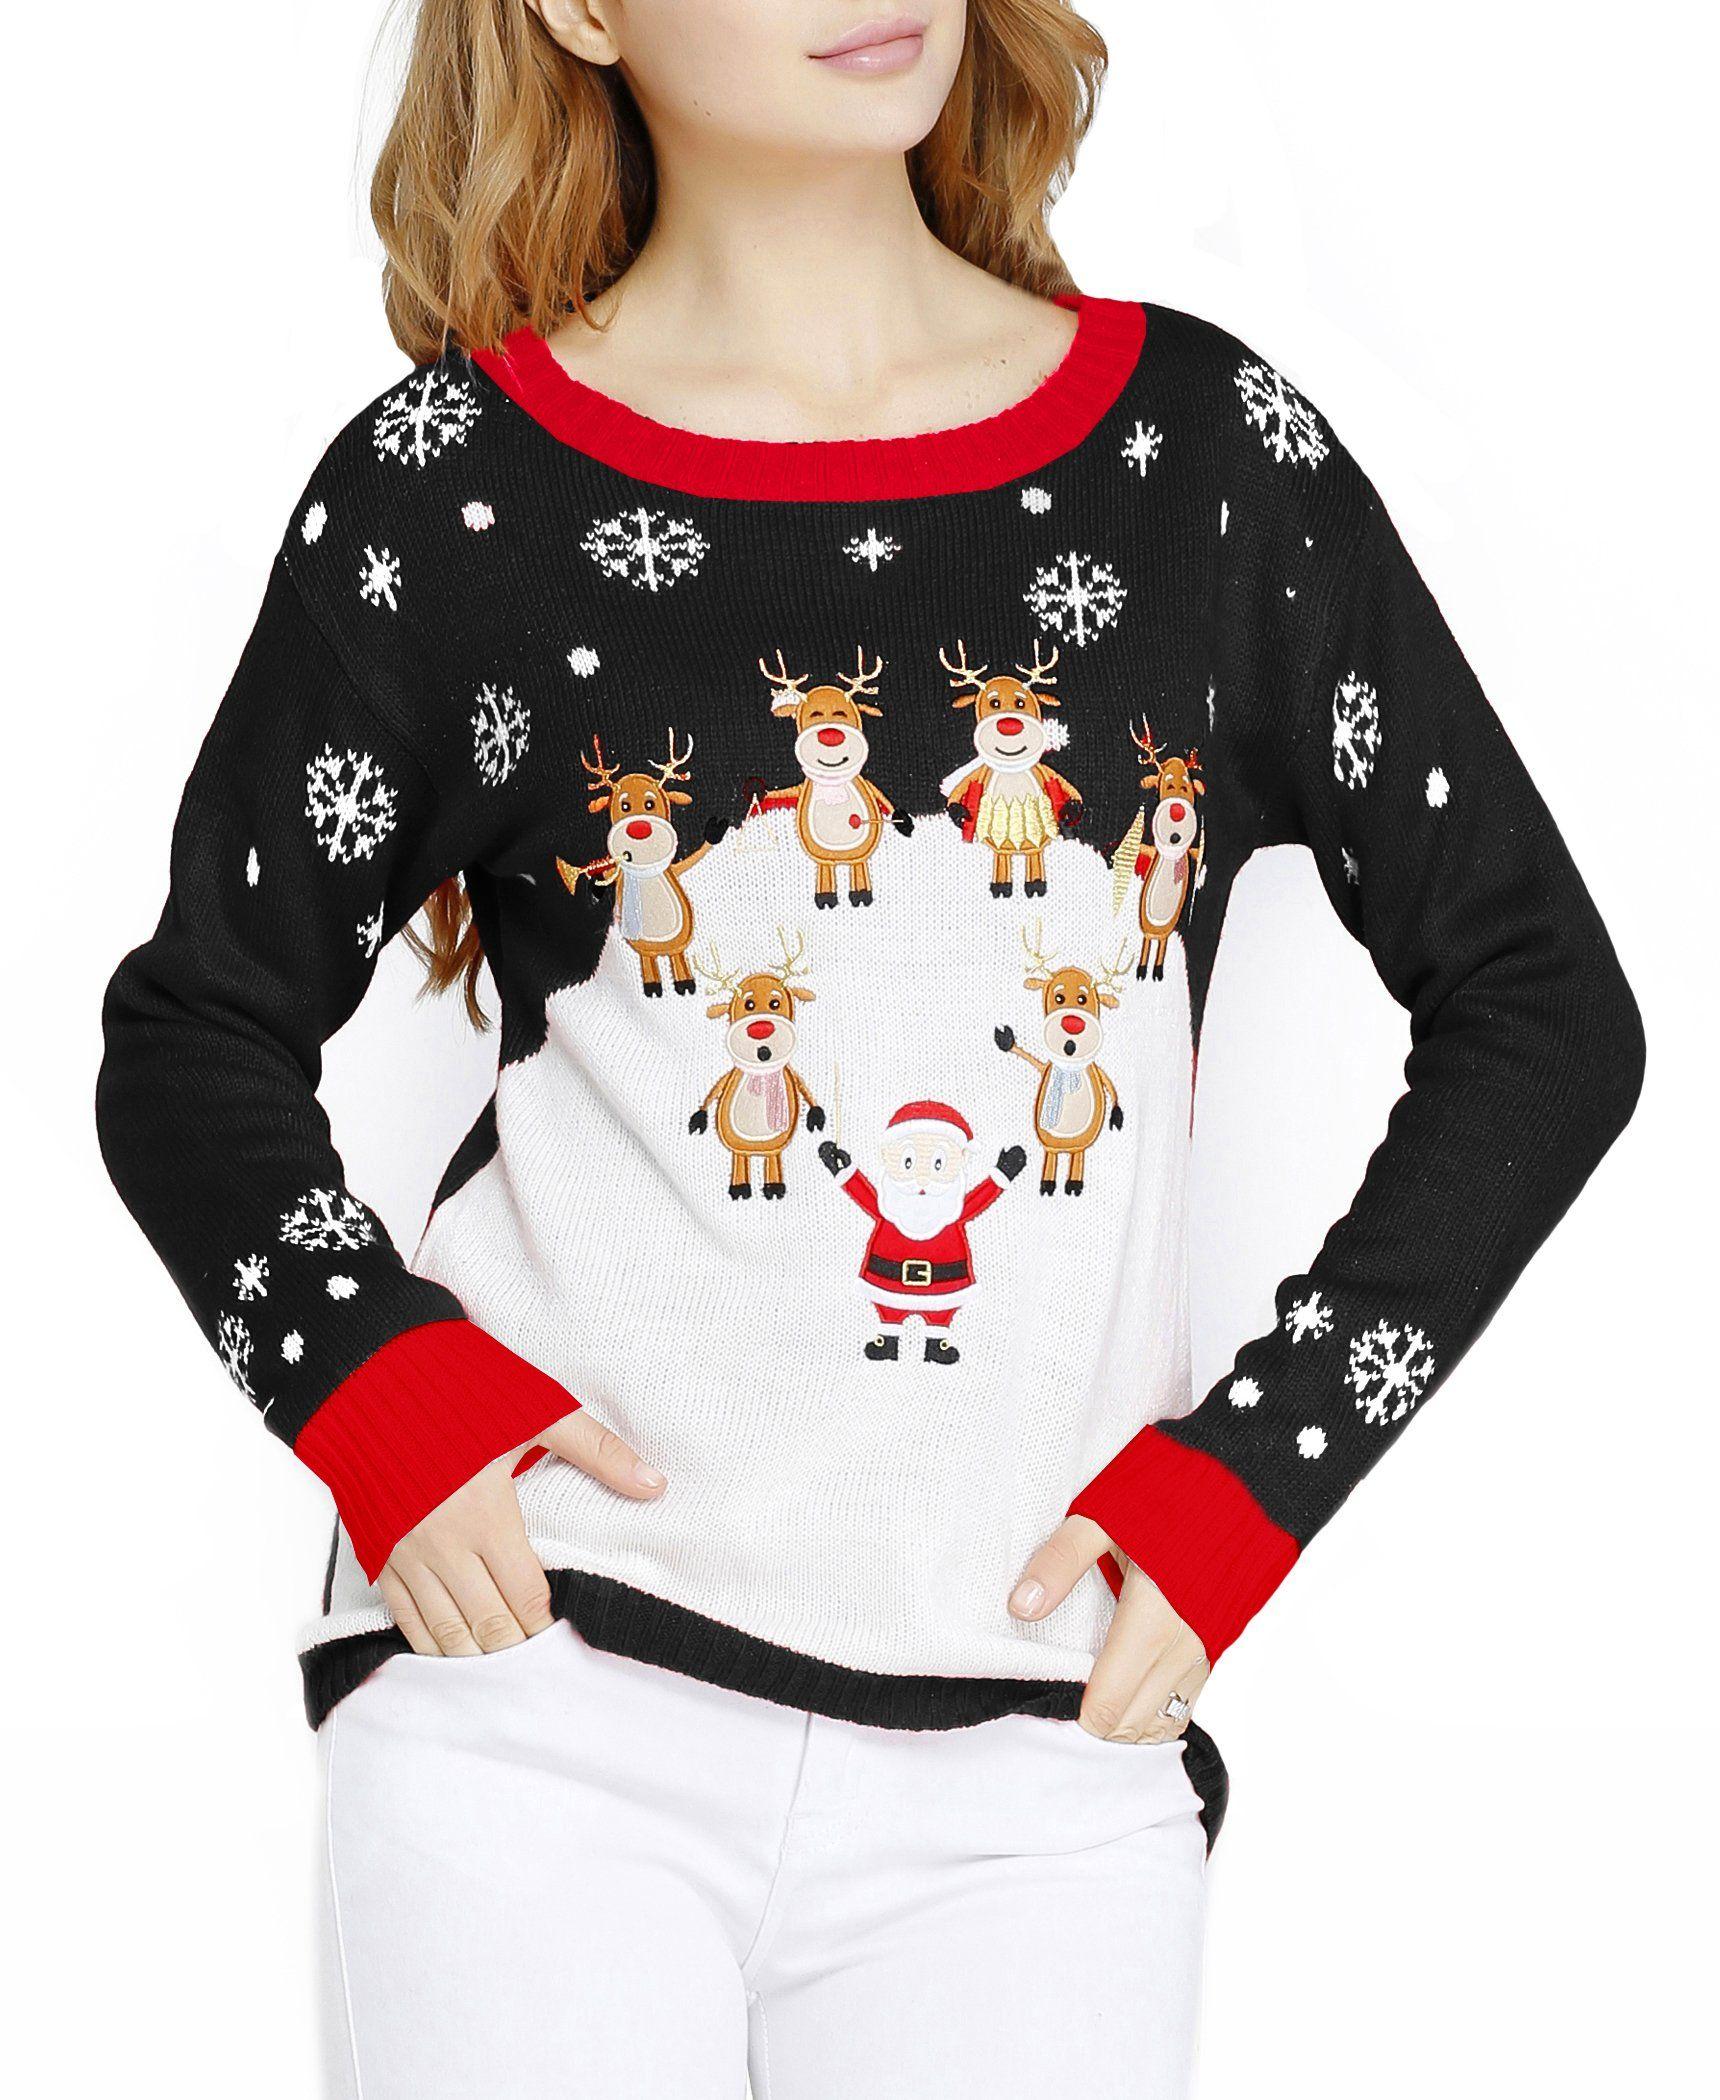 V28®Women Girl Christmas Cute Santa Embroidered Knitted